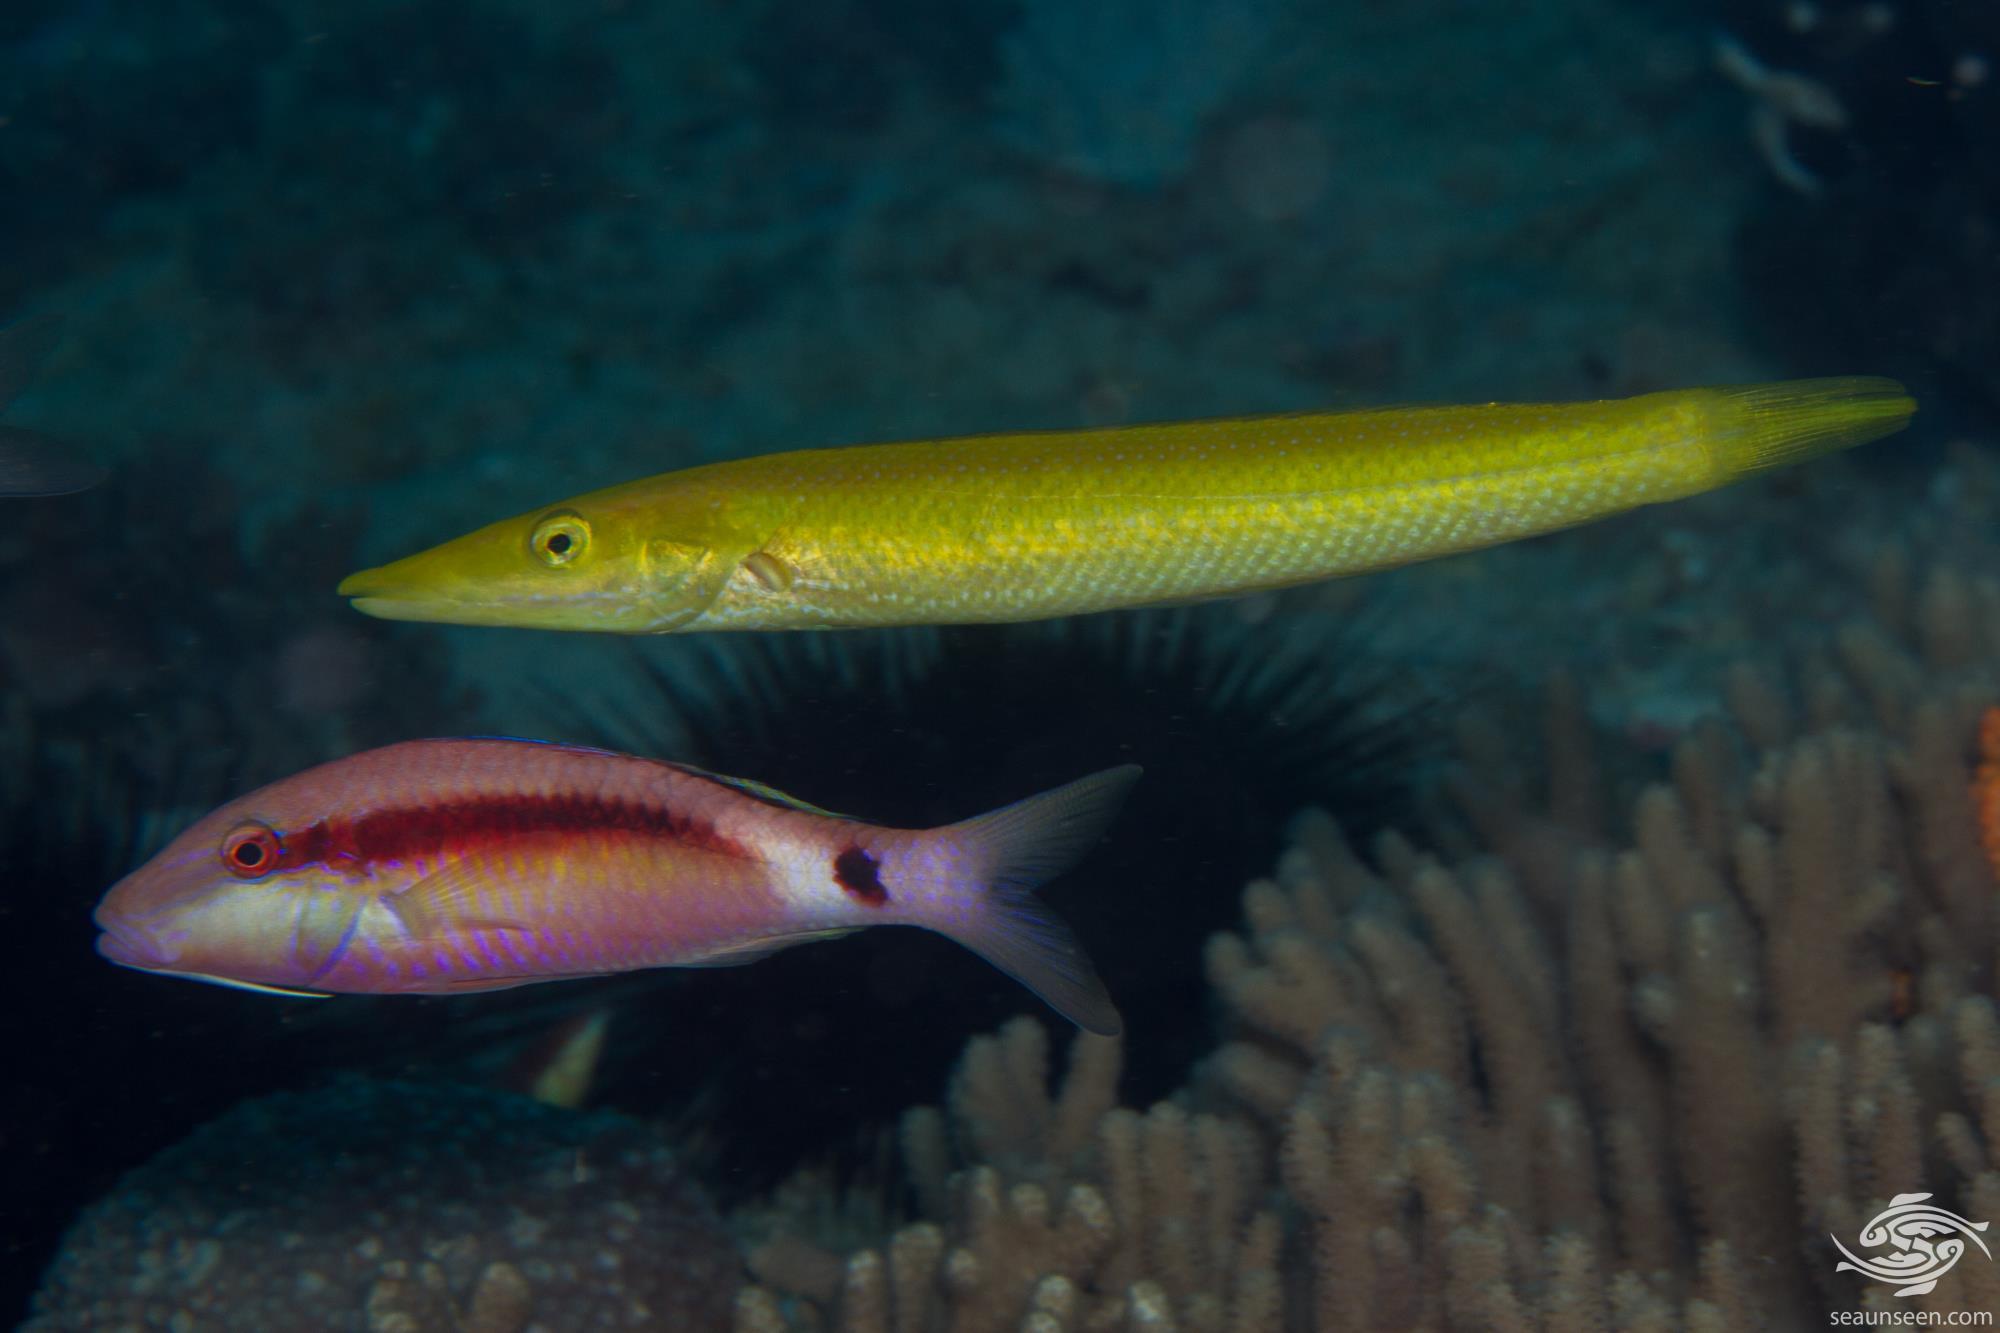 Cigar wrasse (Cheilio inermis) is also known as the Sharp-nosed Rainbowfish, Pêche madame, Julia Larguirucha and Kamasubera